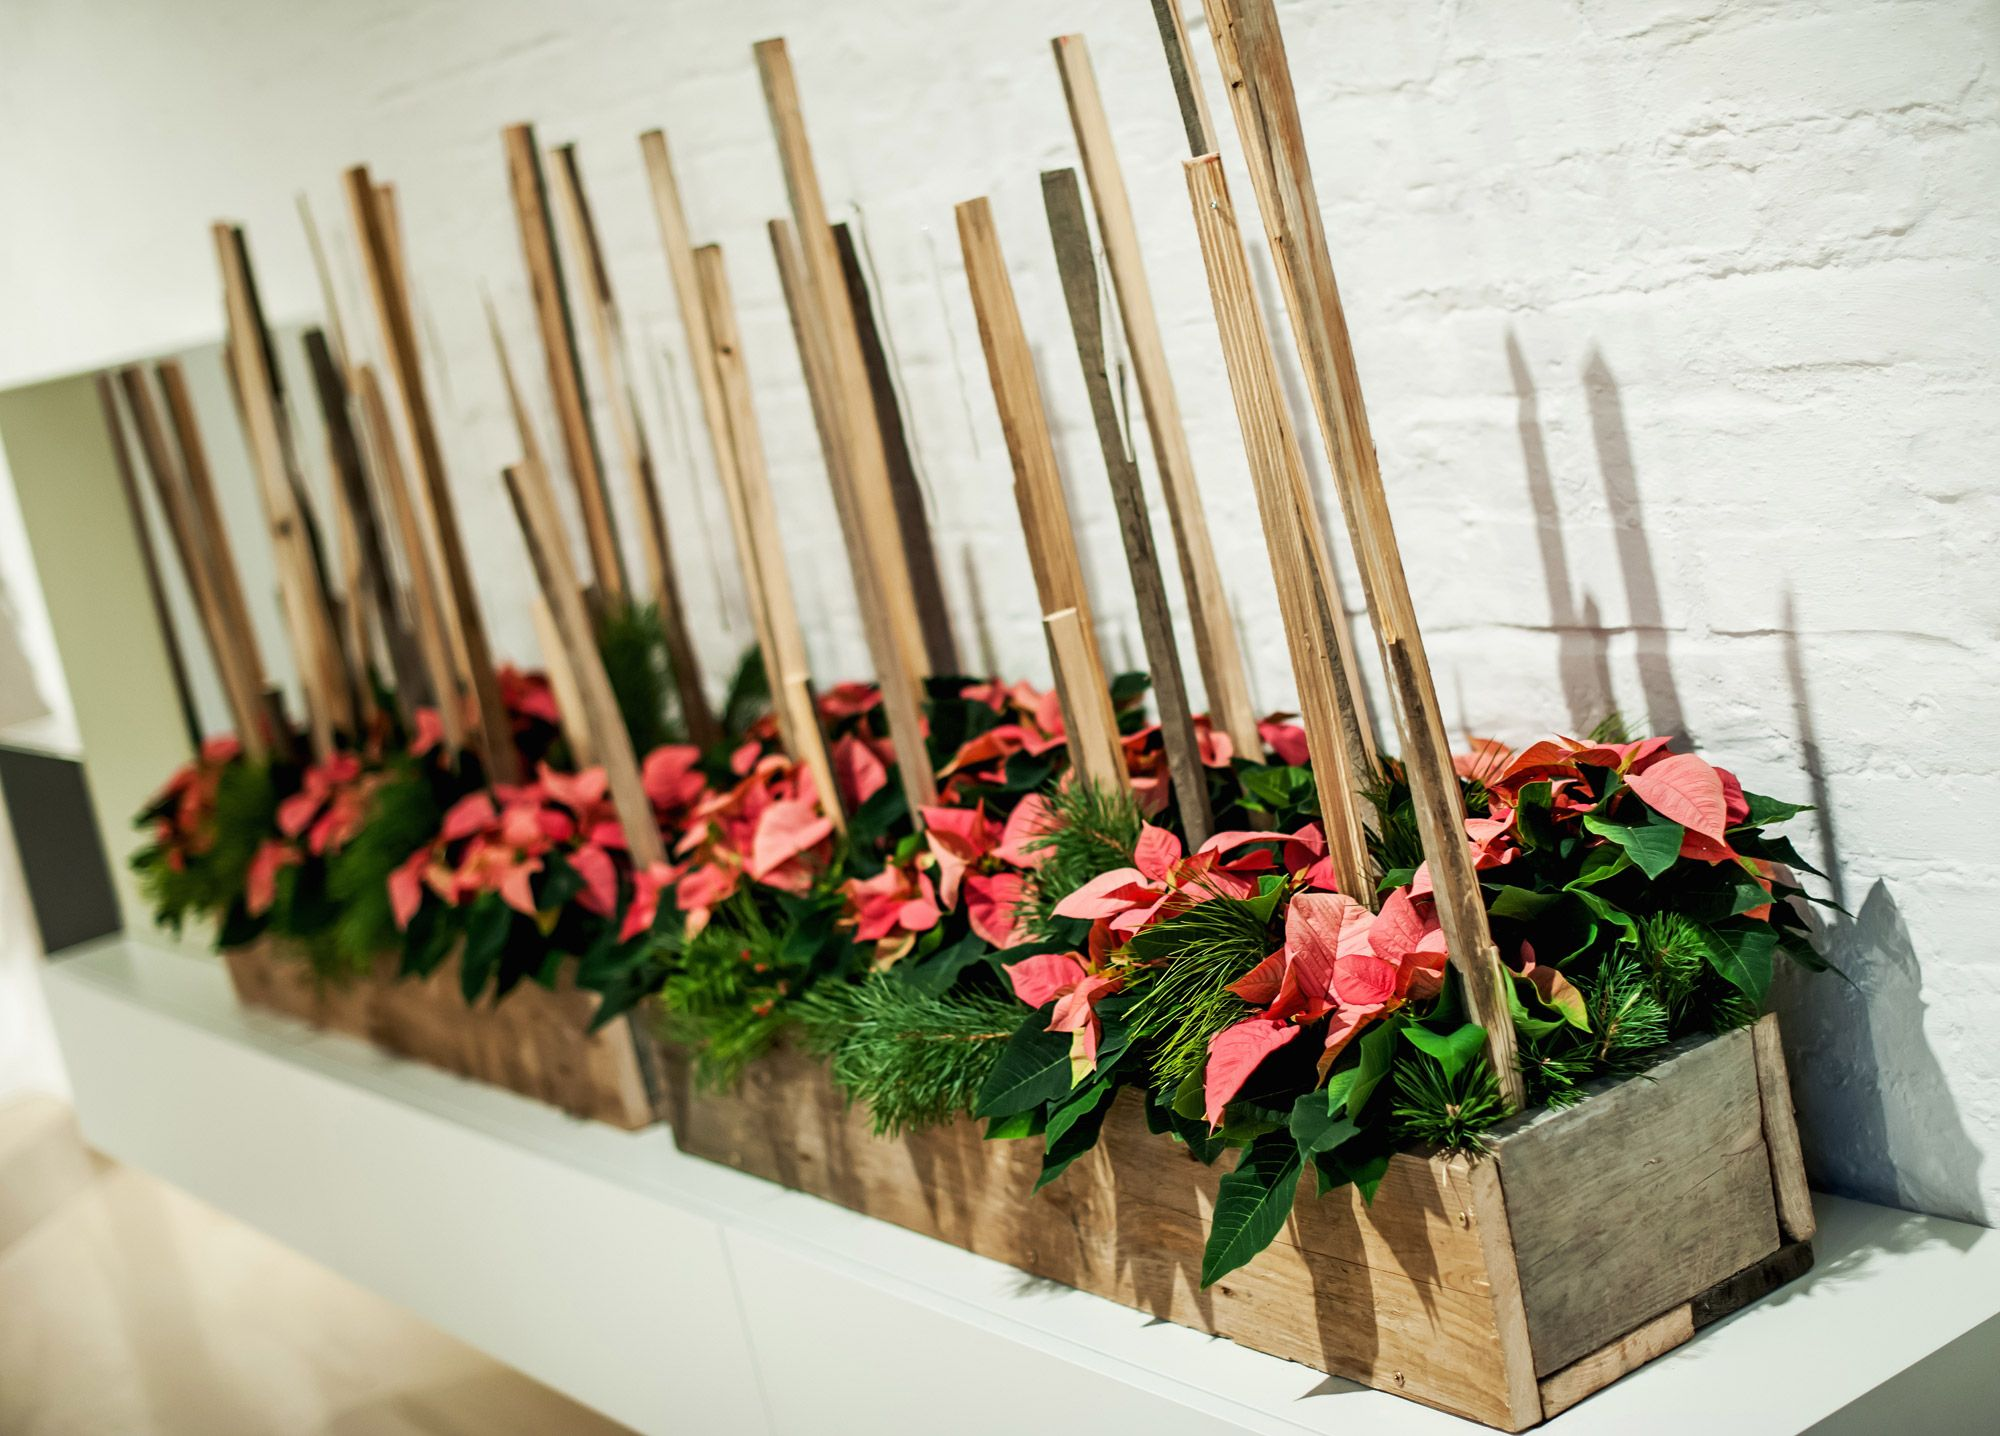 Decoraci n navide a de estilo vintage hogarmania for Decoracion navidena para exteriores